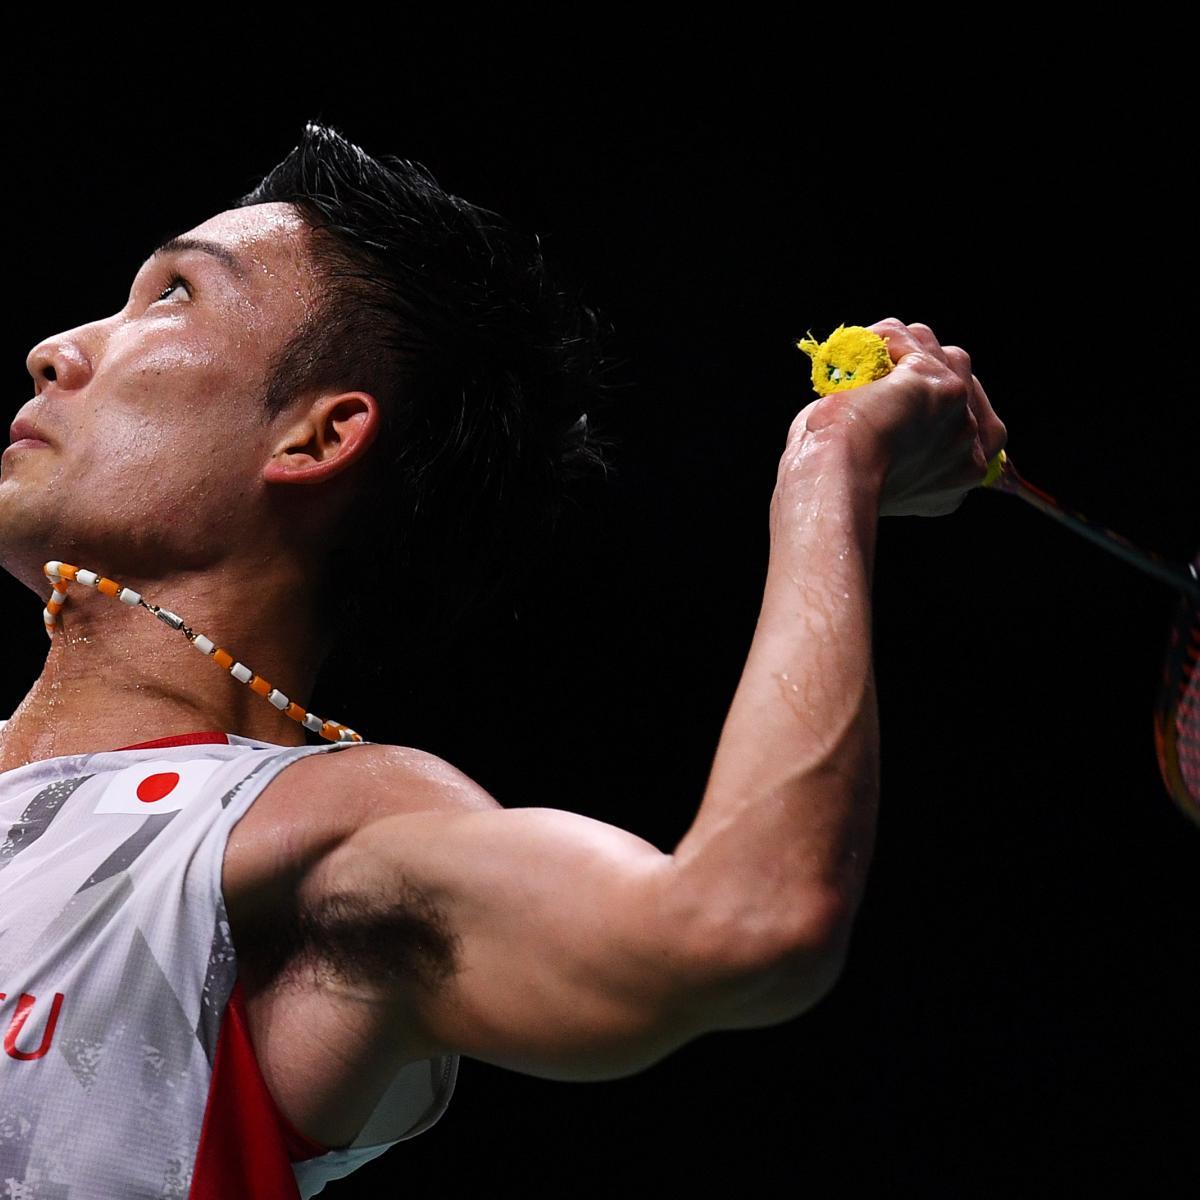 Badminton World Championships 2018: Japan's Kento Momota Wins Gold Medal